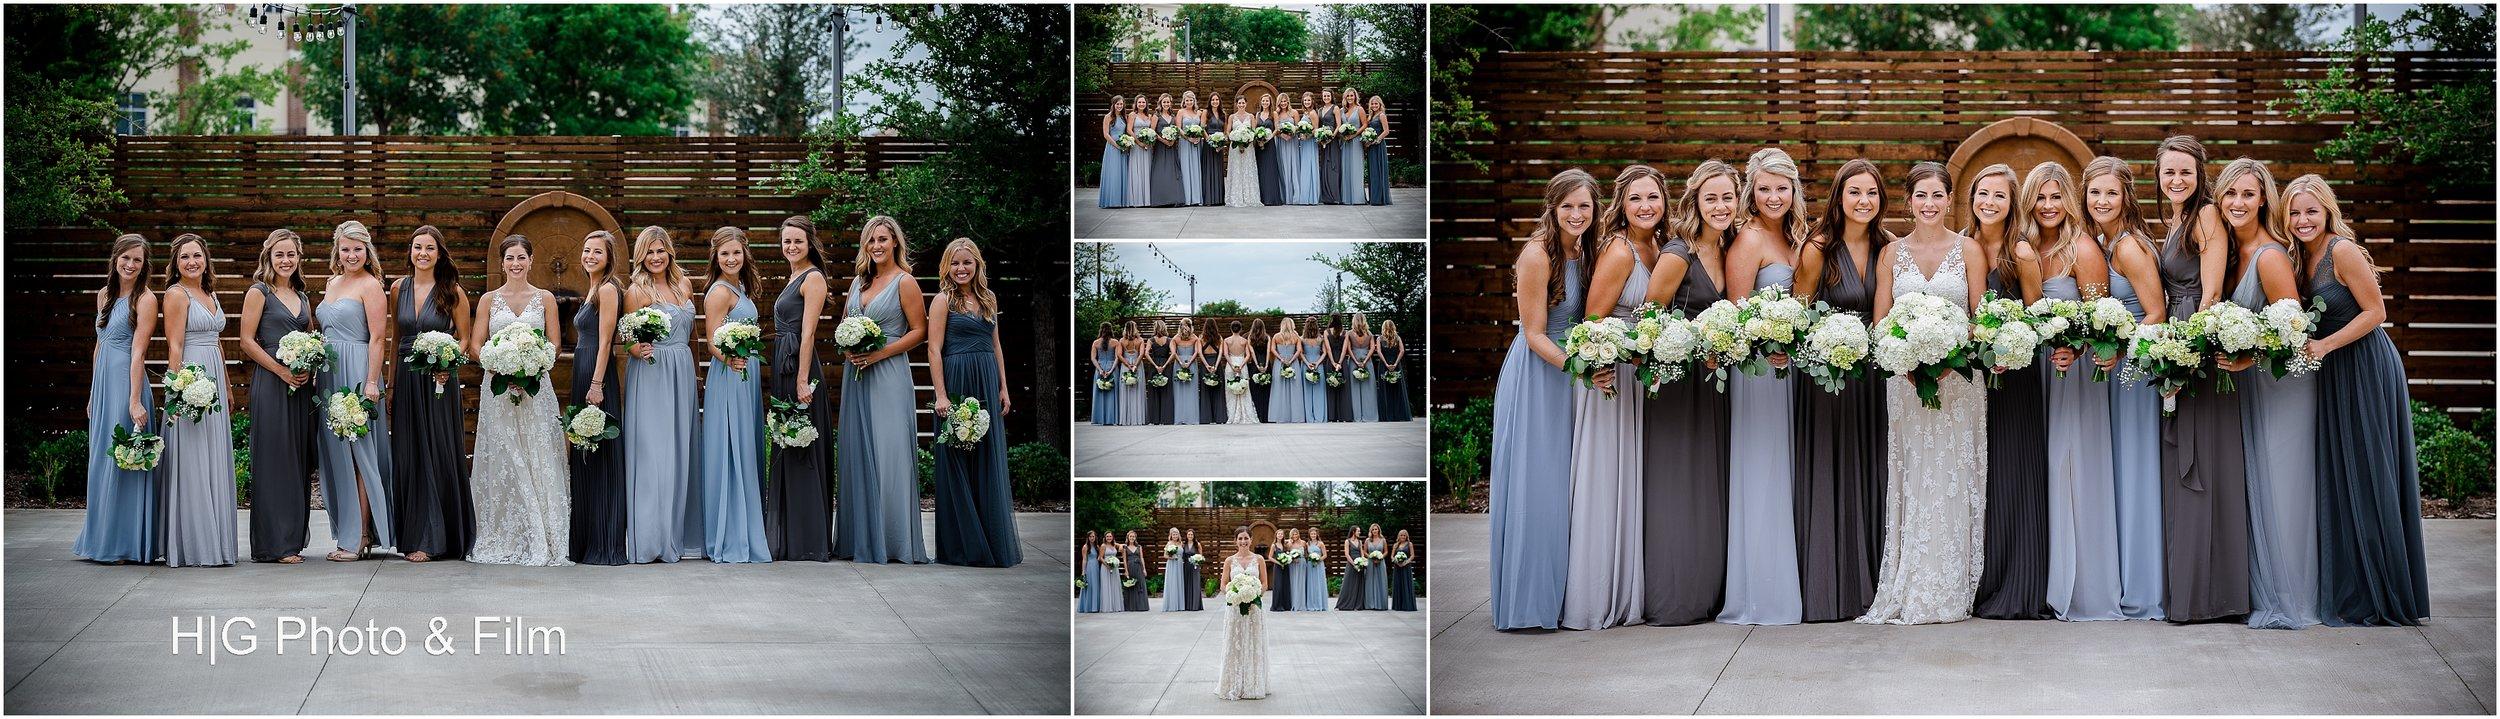 Look at those dresses